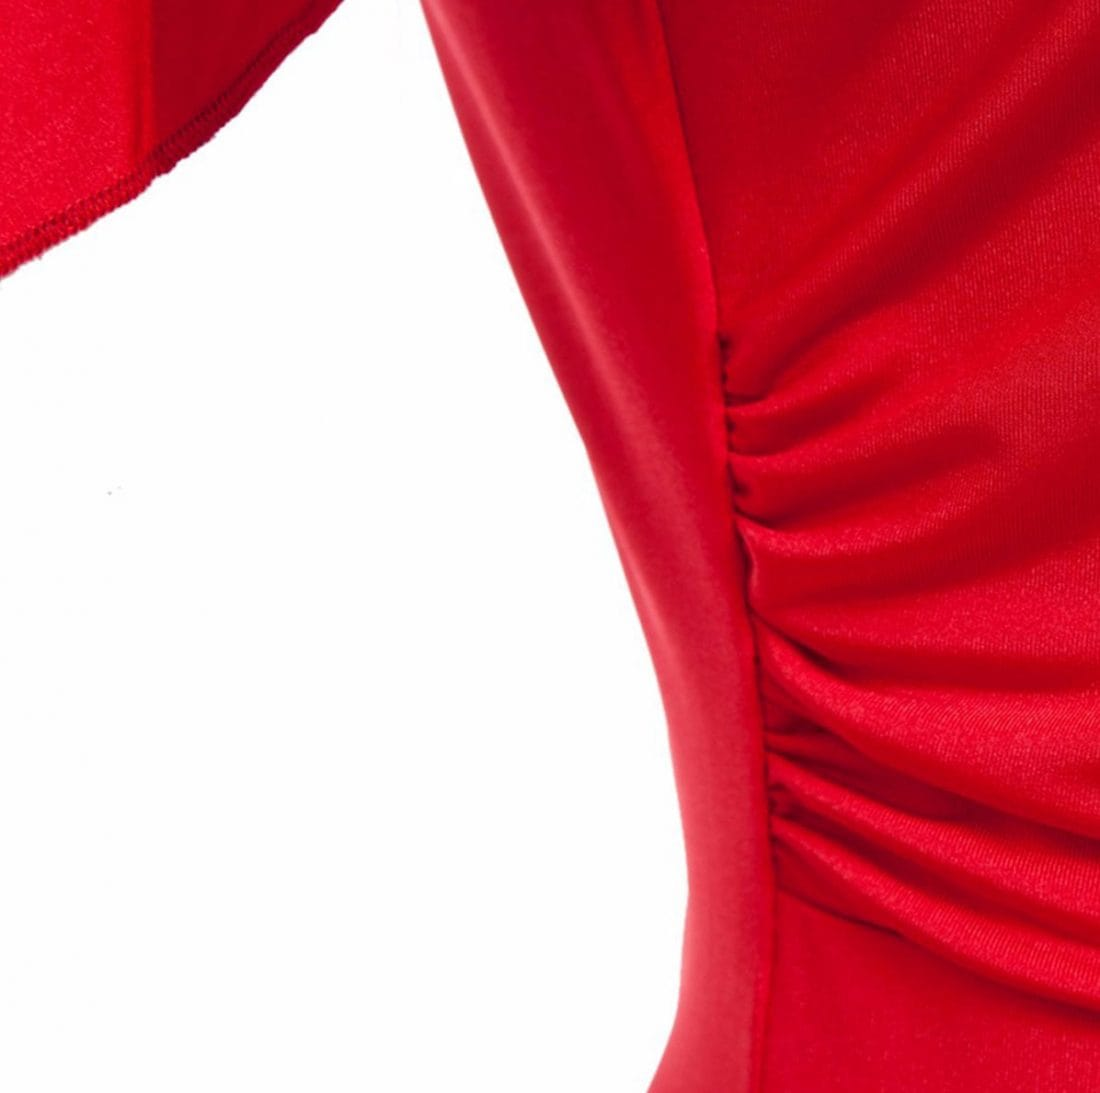 M0188 red10 Short Sleeve Dresses maureens.com boutique